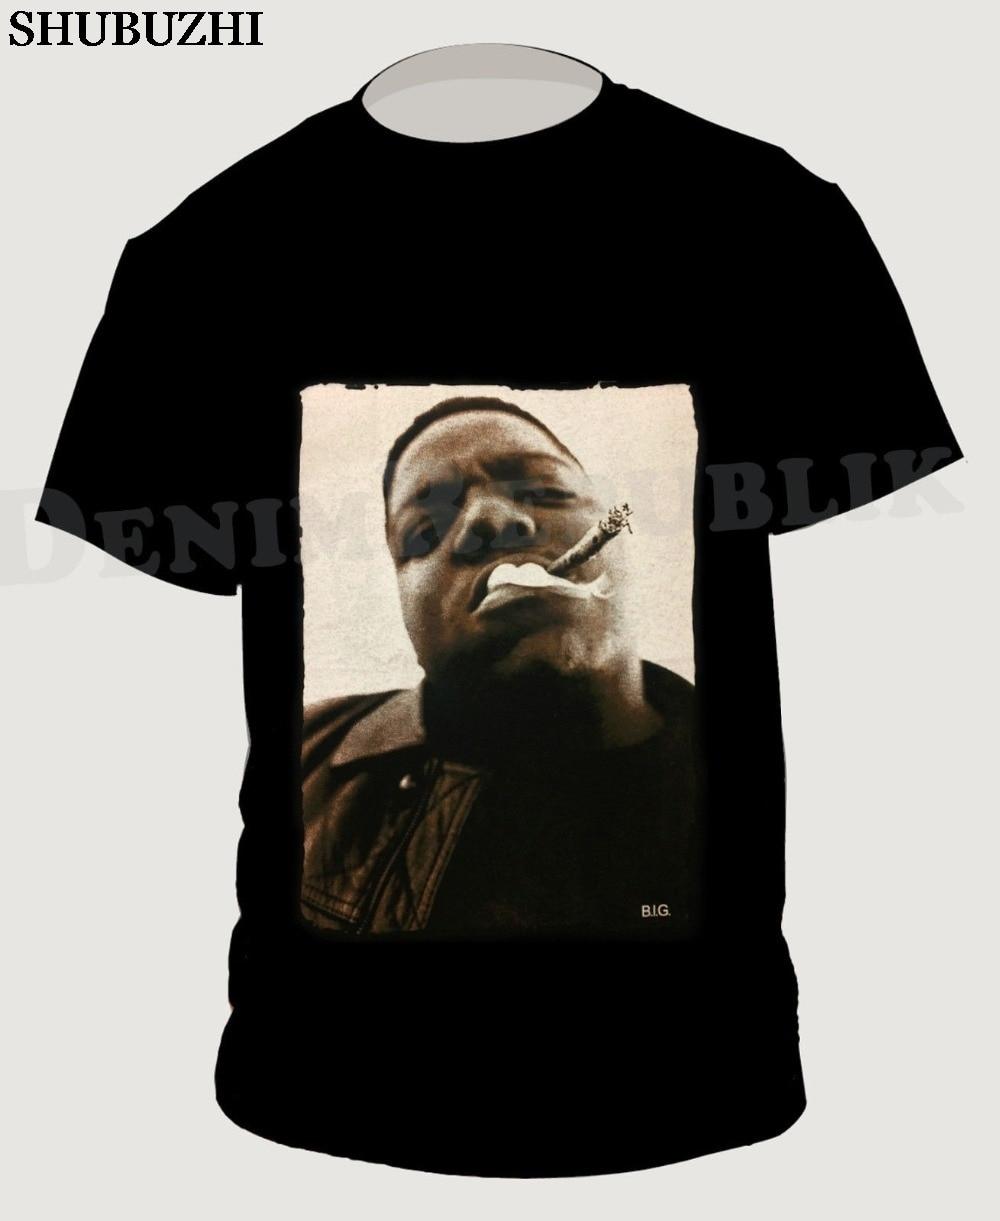 Notorious B.I.G. Schwarz Herren T-Shirt Biggie Smalls Rapper Hip Hop T Große Neue baumwolle Mode Männer Hohe Qualität Tees Casual Tee